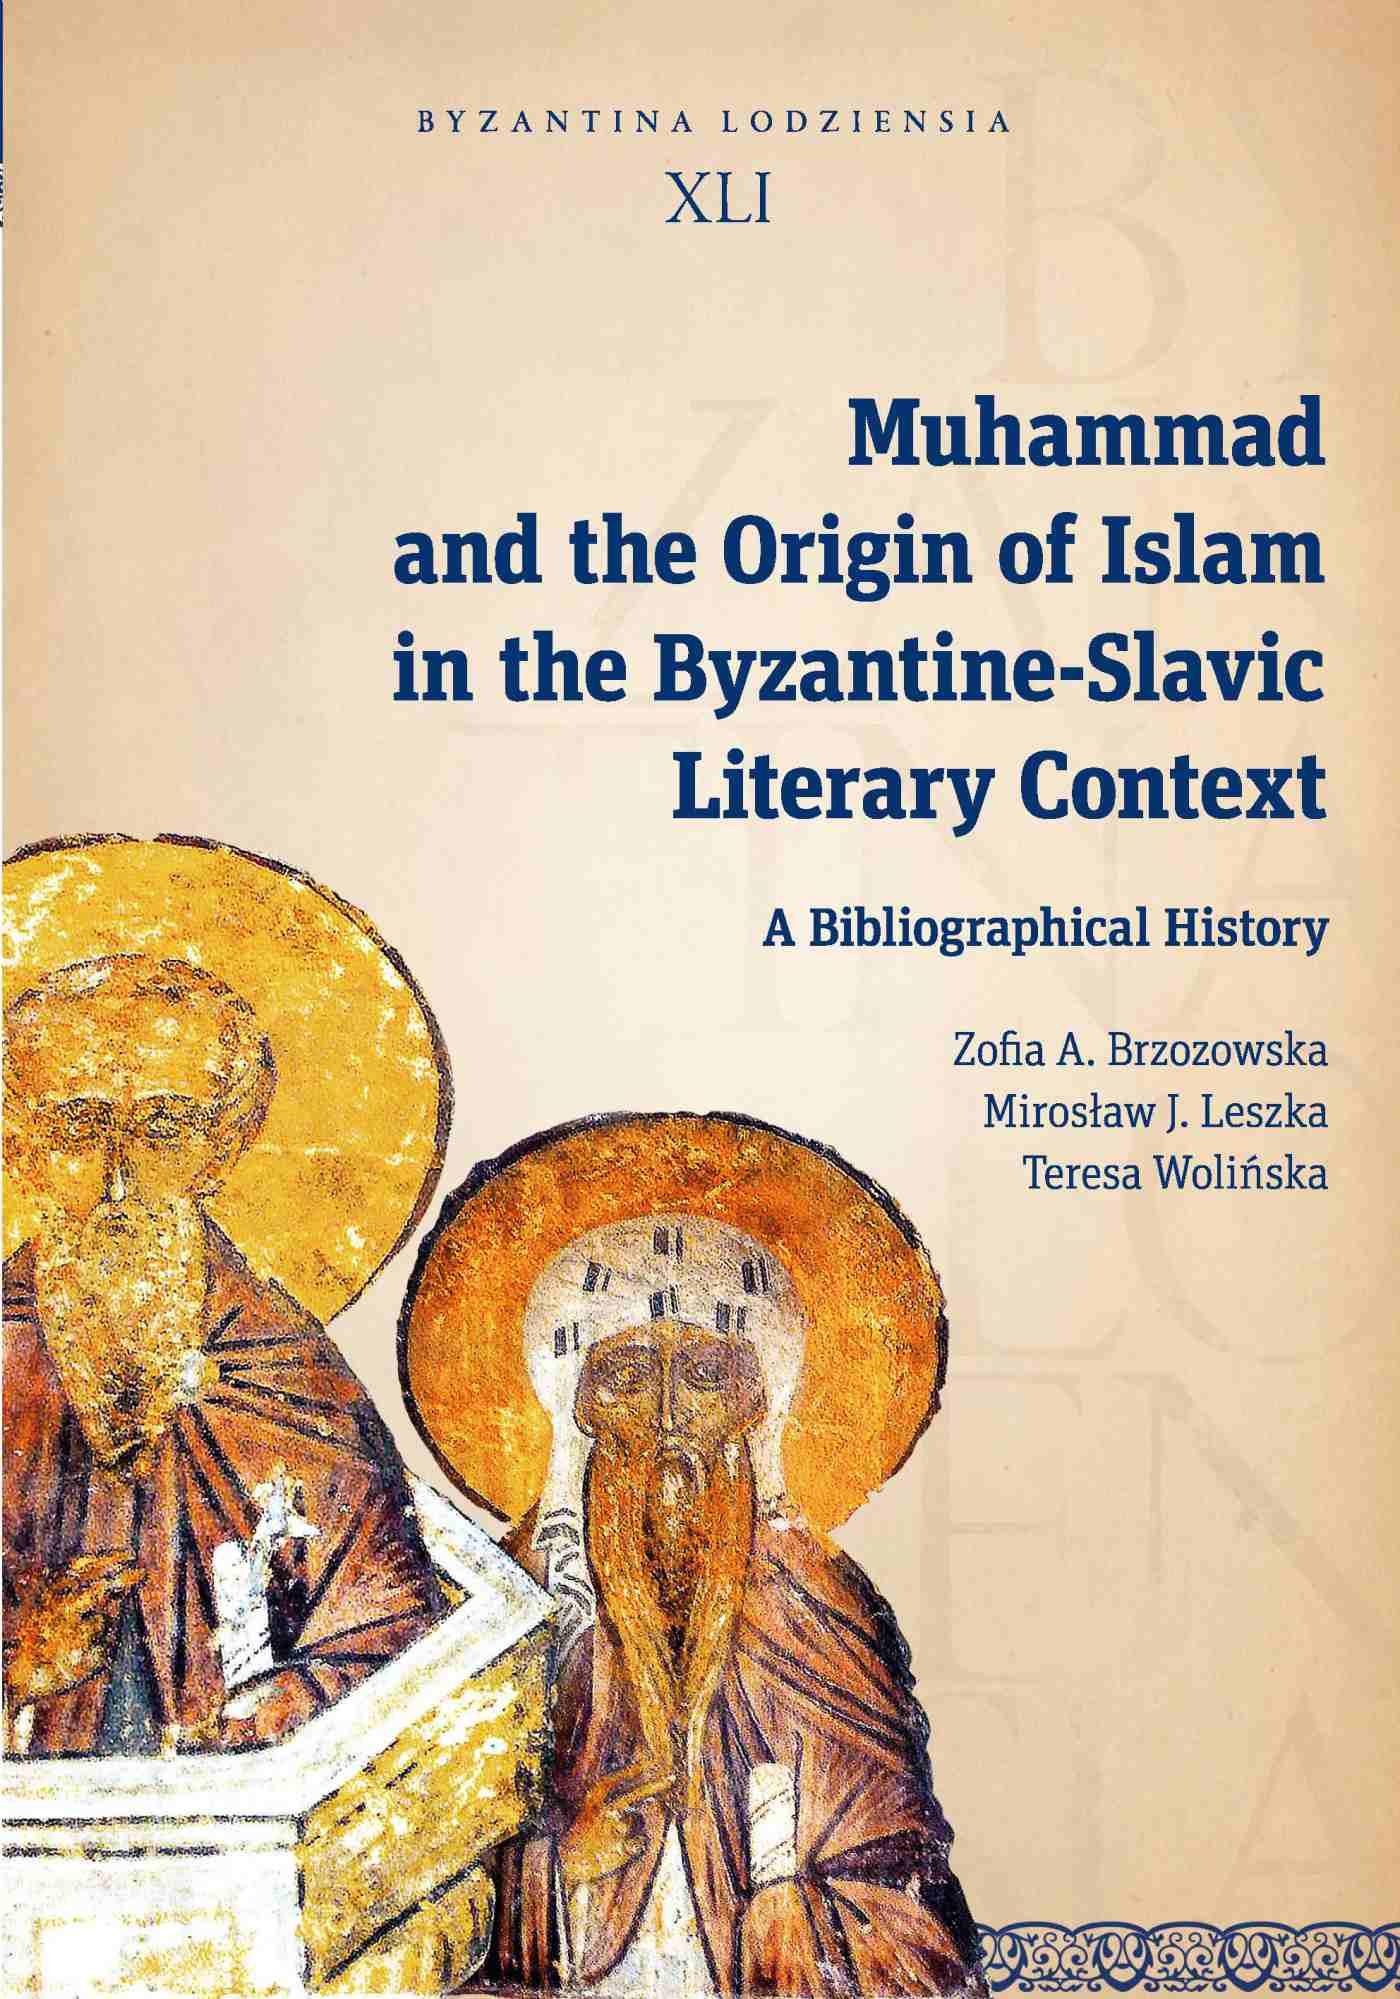 Muhammad and the Origin of Islam in the Byzantine-Slavic Literary Context. A Bibliographical History - Ebook (Książka PDF) do pobrania w formacie PDF